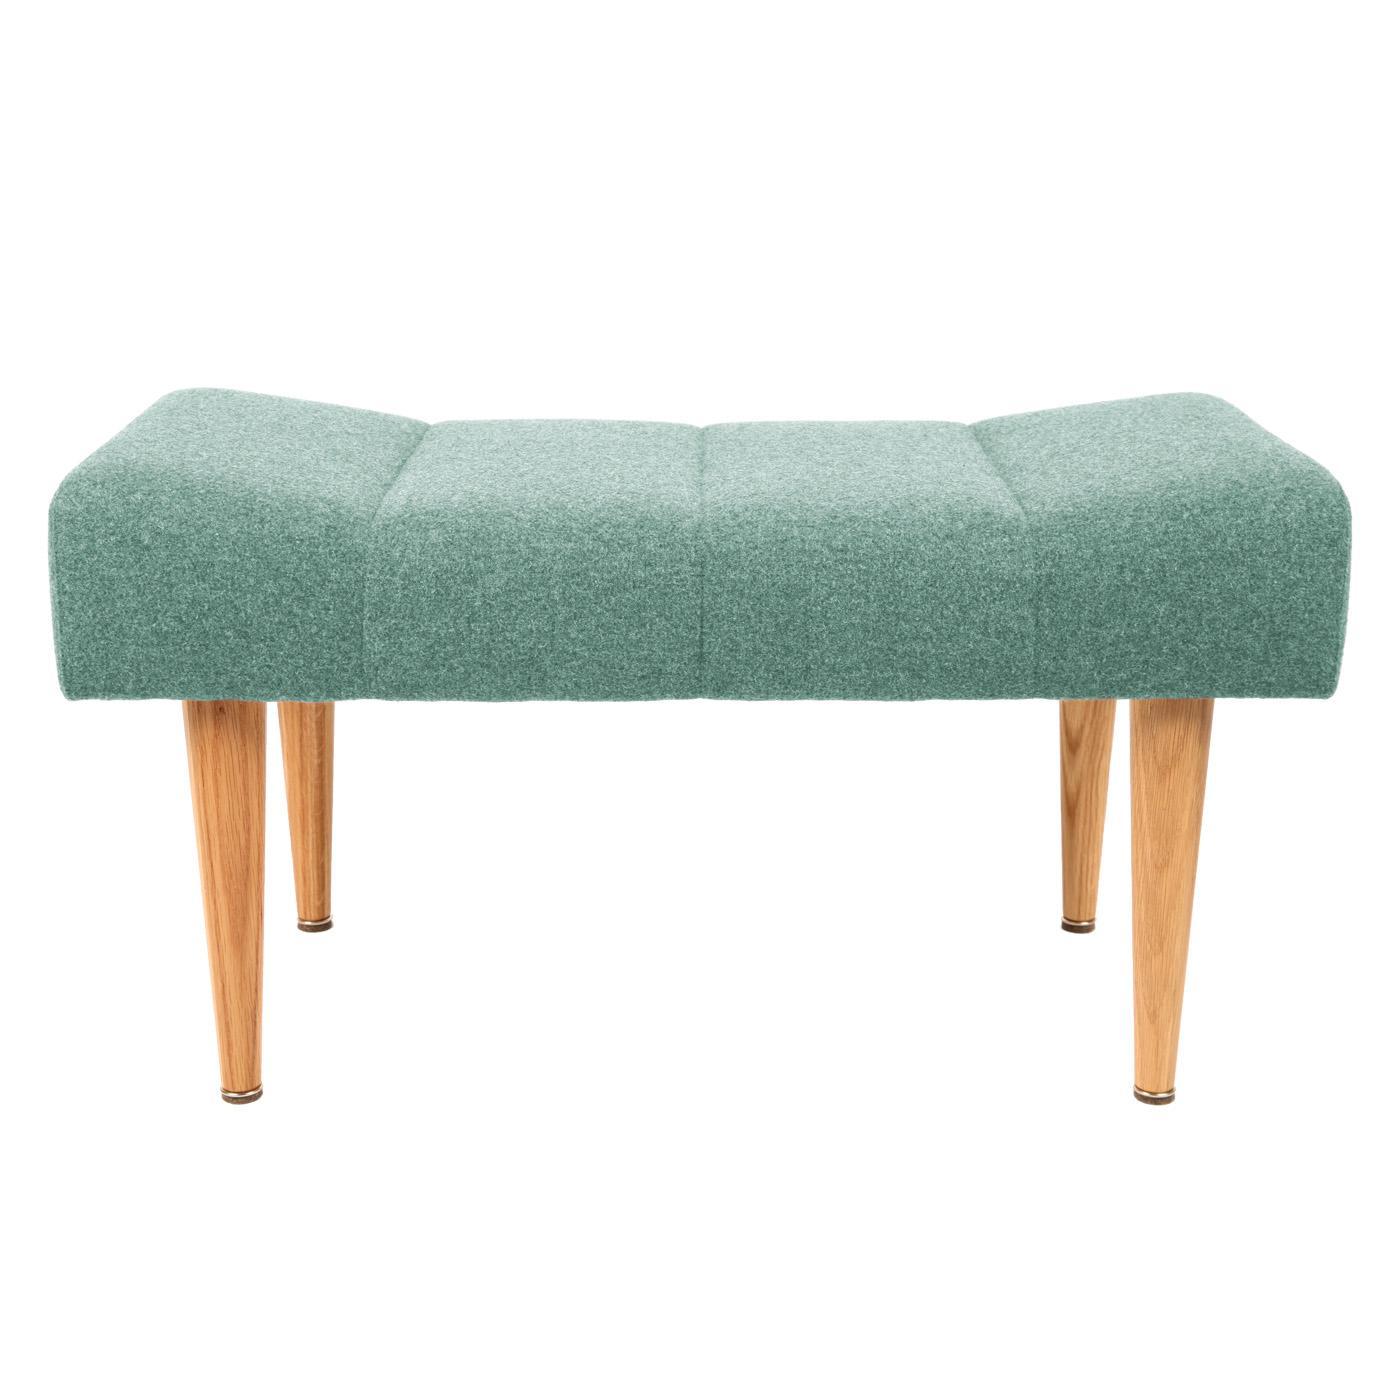 gepolsterter sitzhocker in gr n skandinavisches design. Black Bedroom Furniture Sets. Home Design Ideas